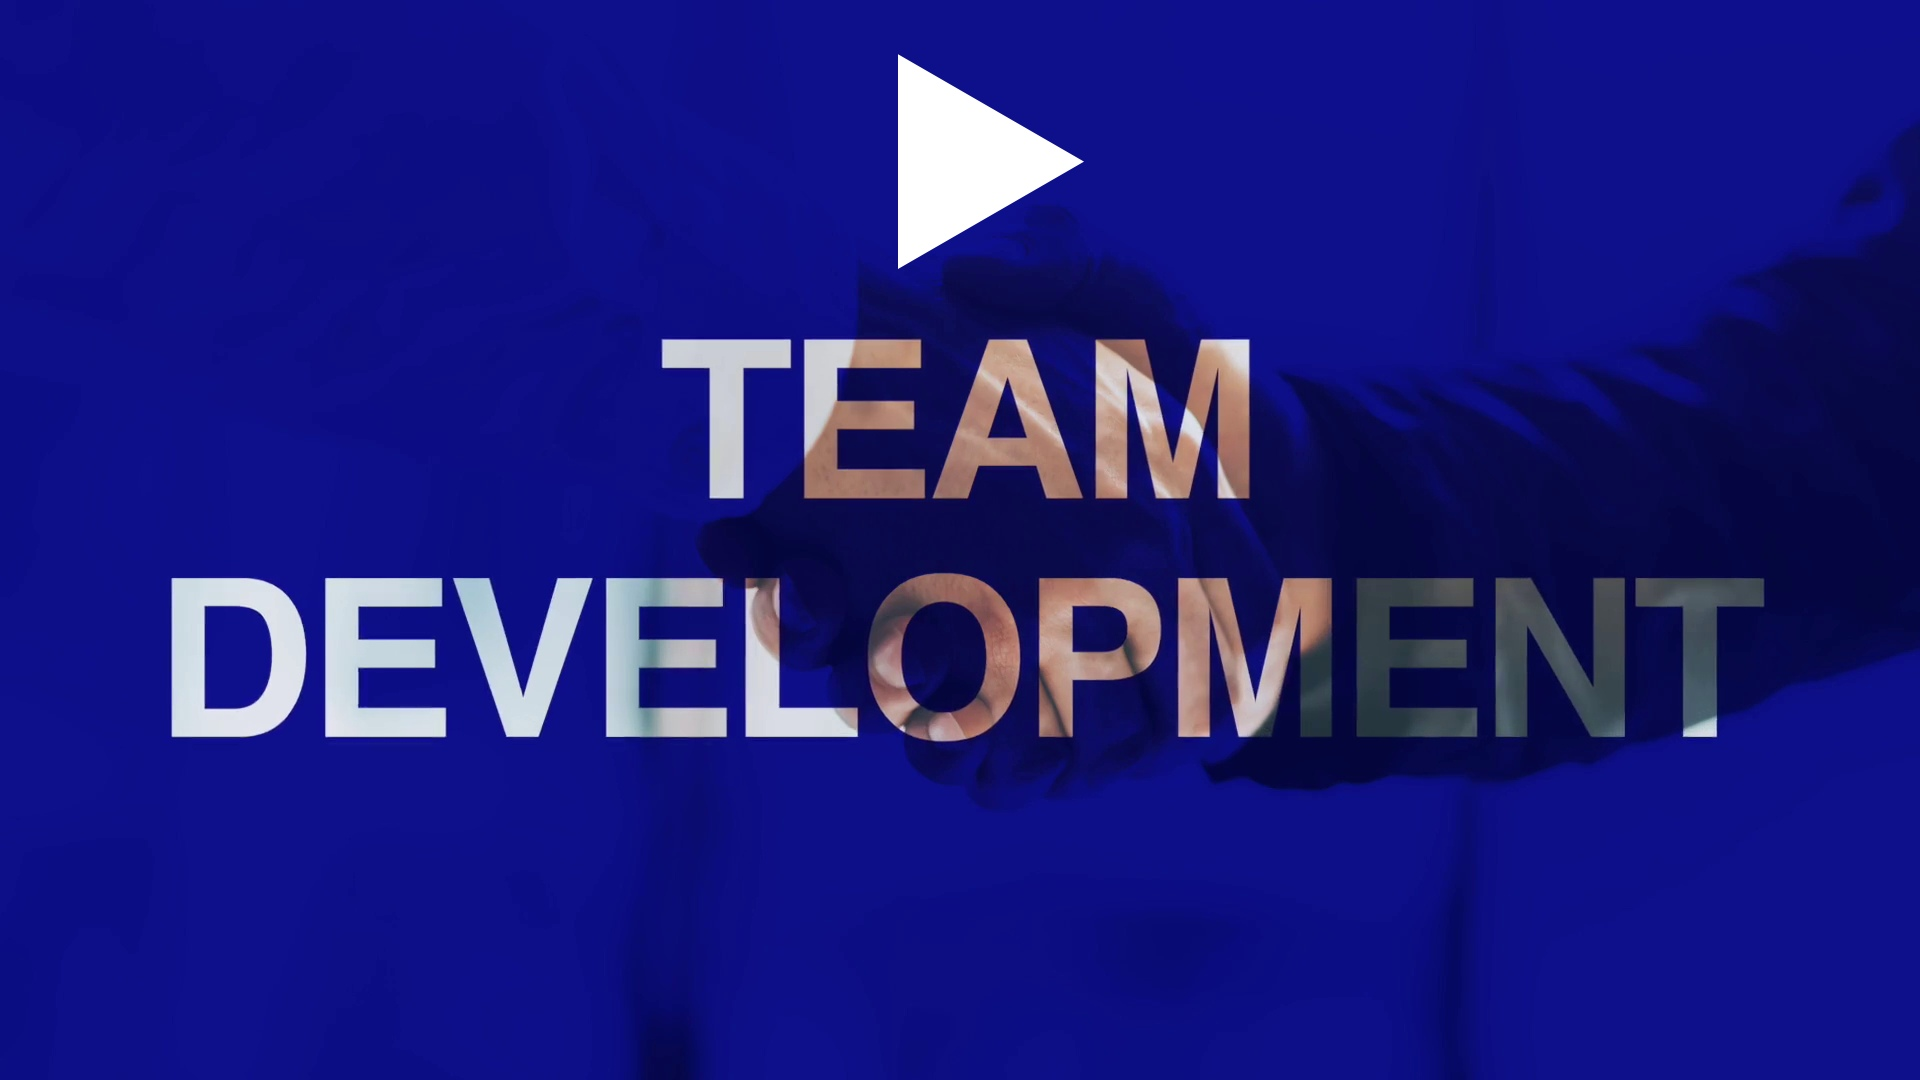 Team development and facilitation